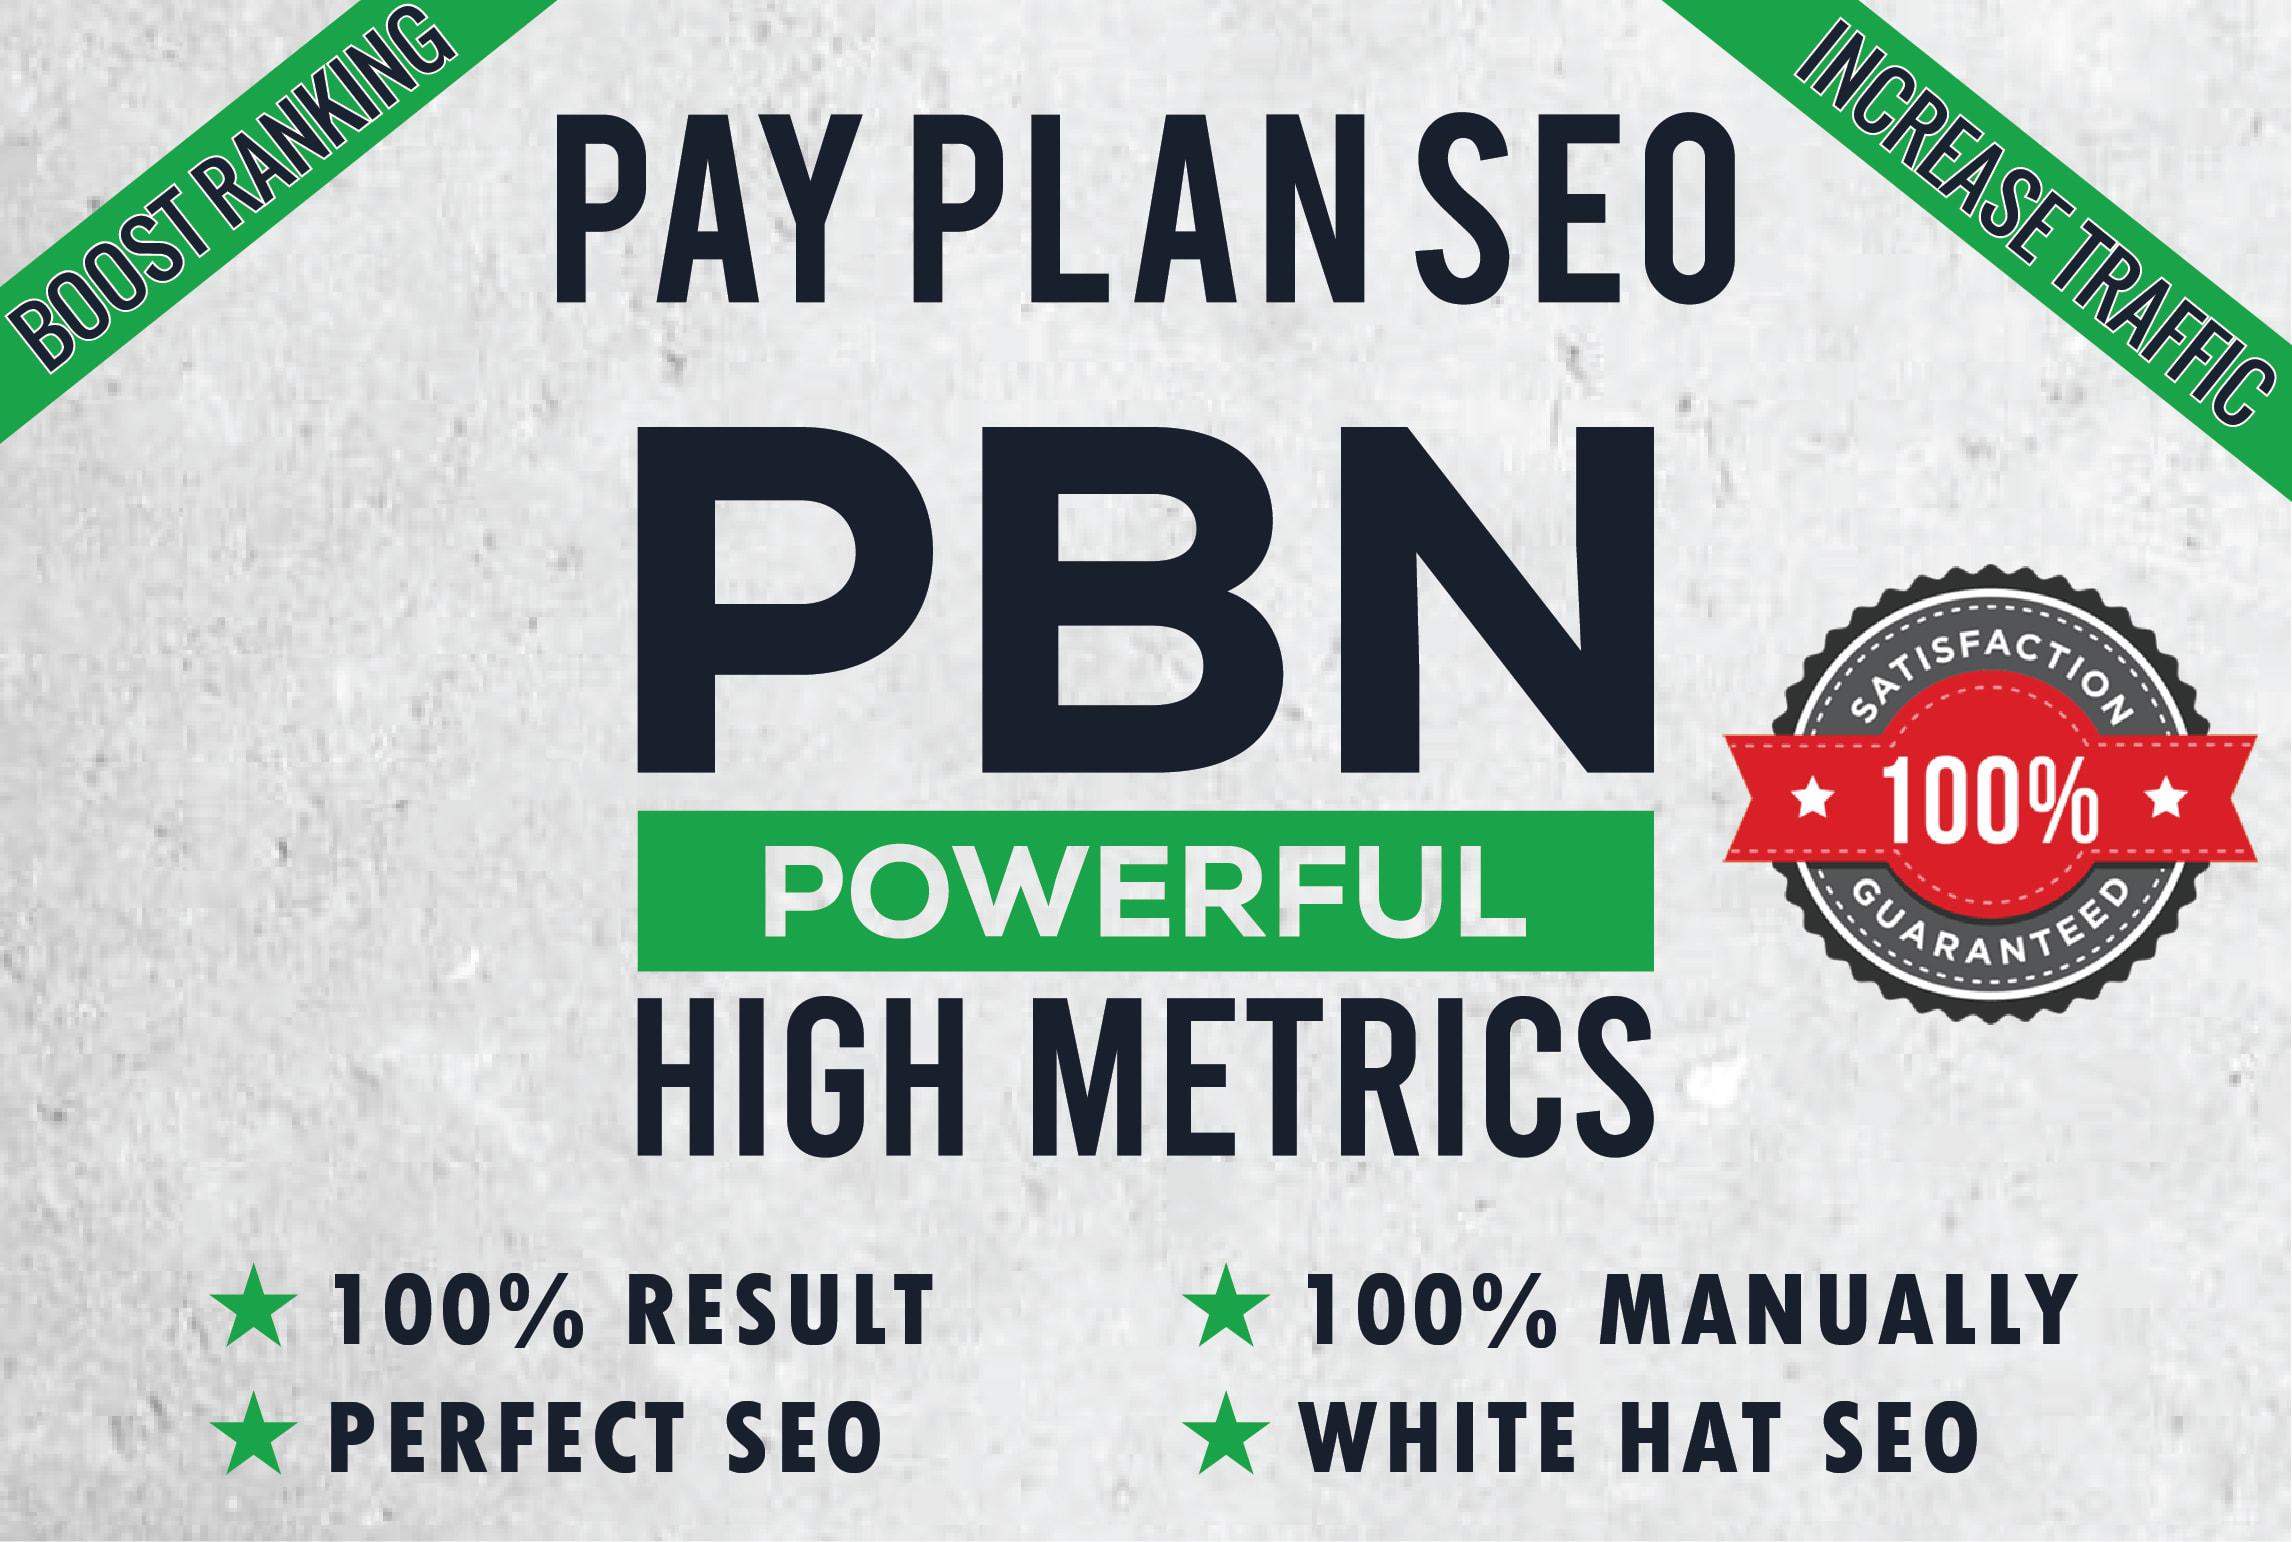 Provide 100 homepage seo pbn backlinks fast daliviry